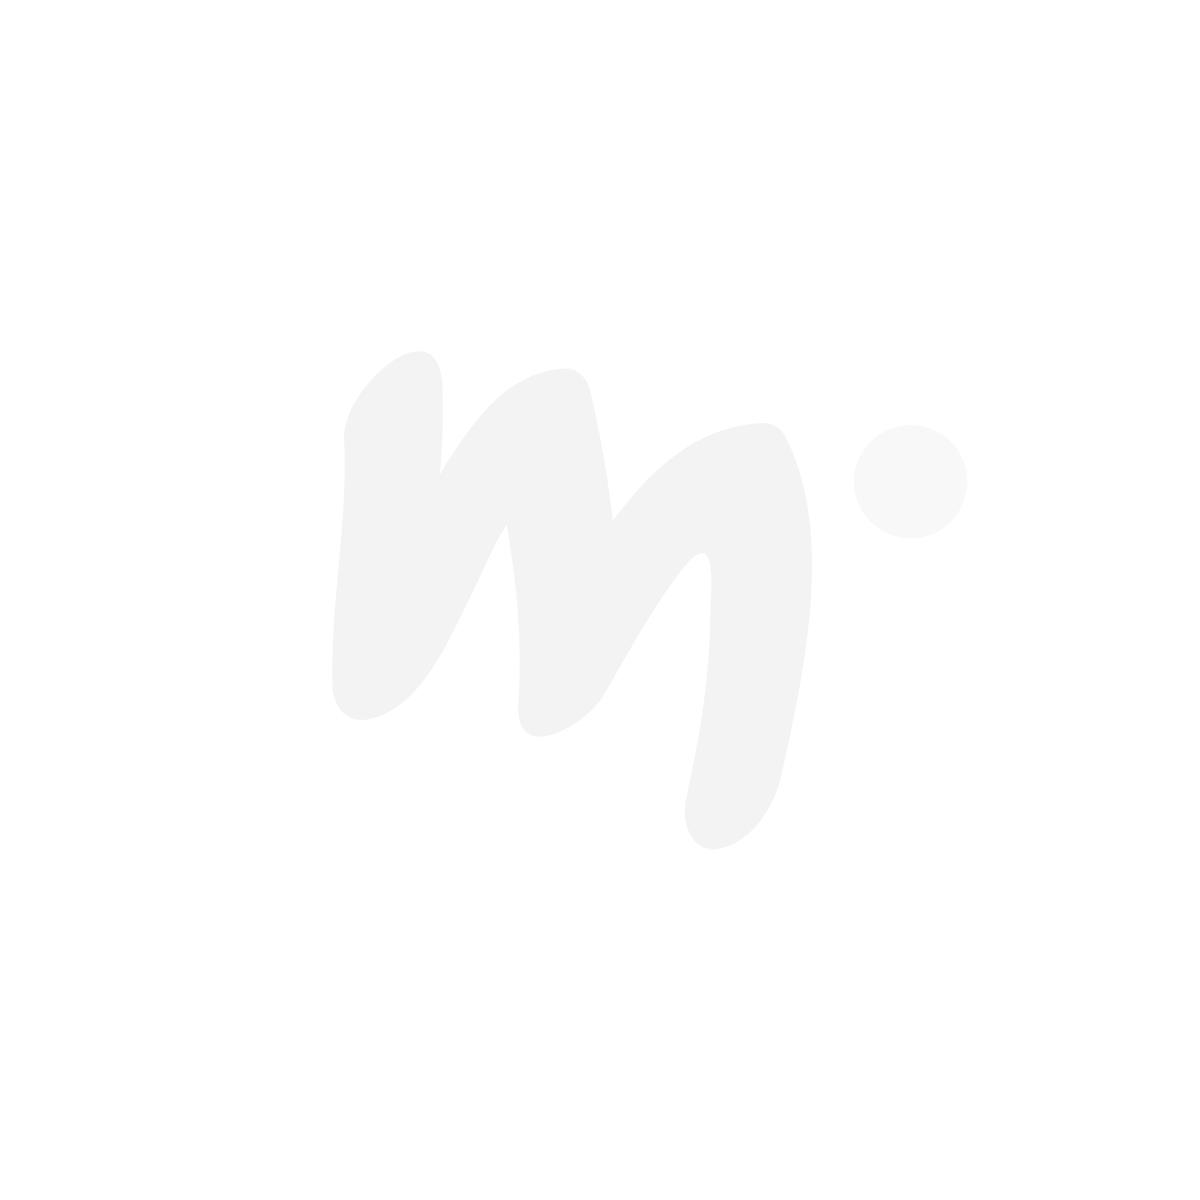 Mx Deco Saaristotonttu harmaa 30 cm